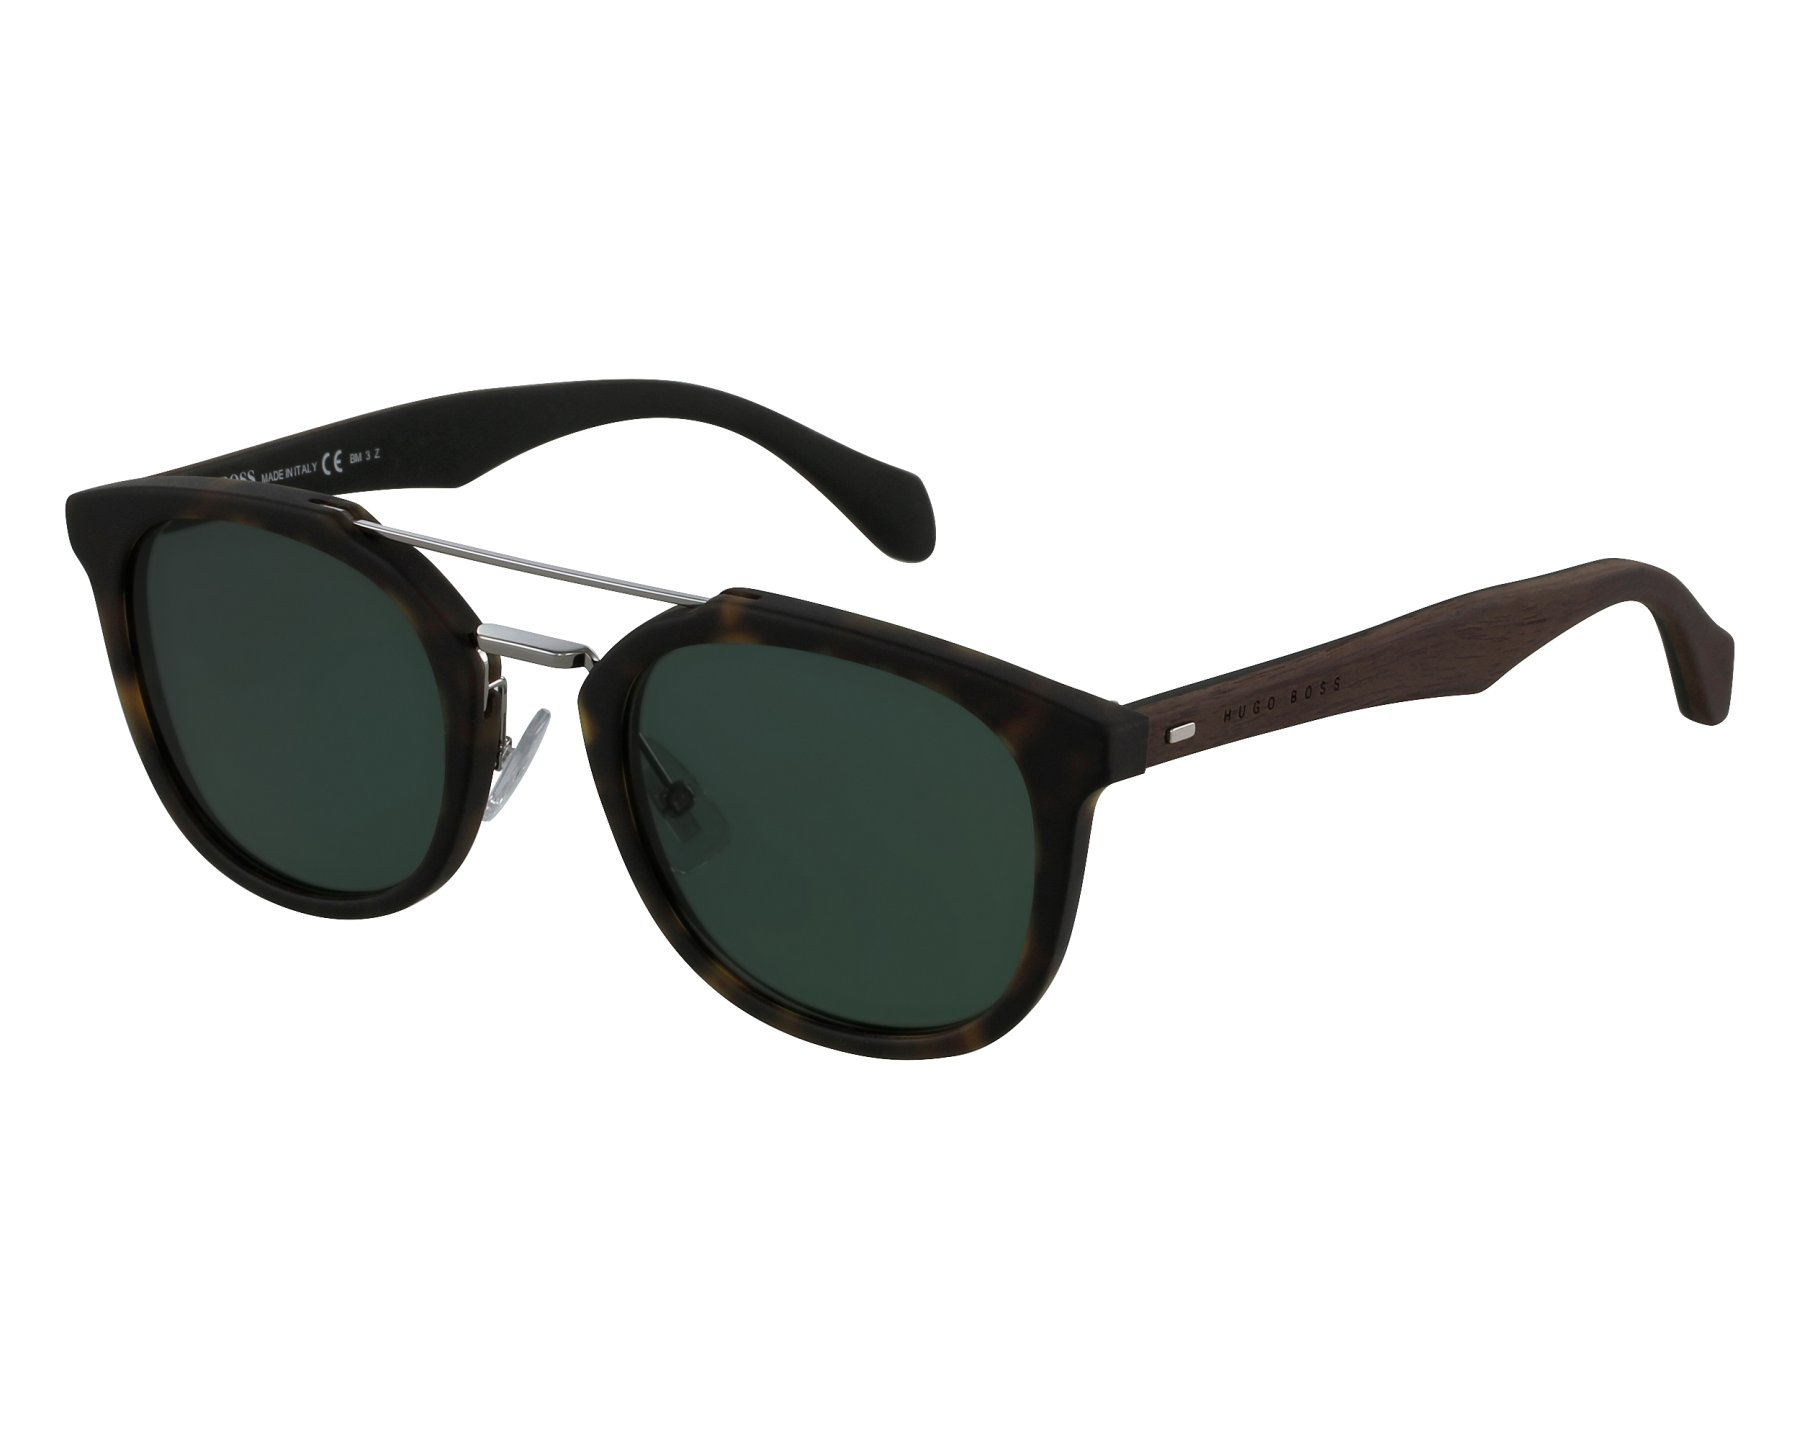 5652540eed Gafas de sol Hugo Boss BOSS-0777-S RBH/UC 51-23